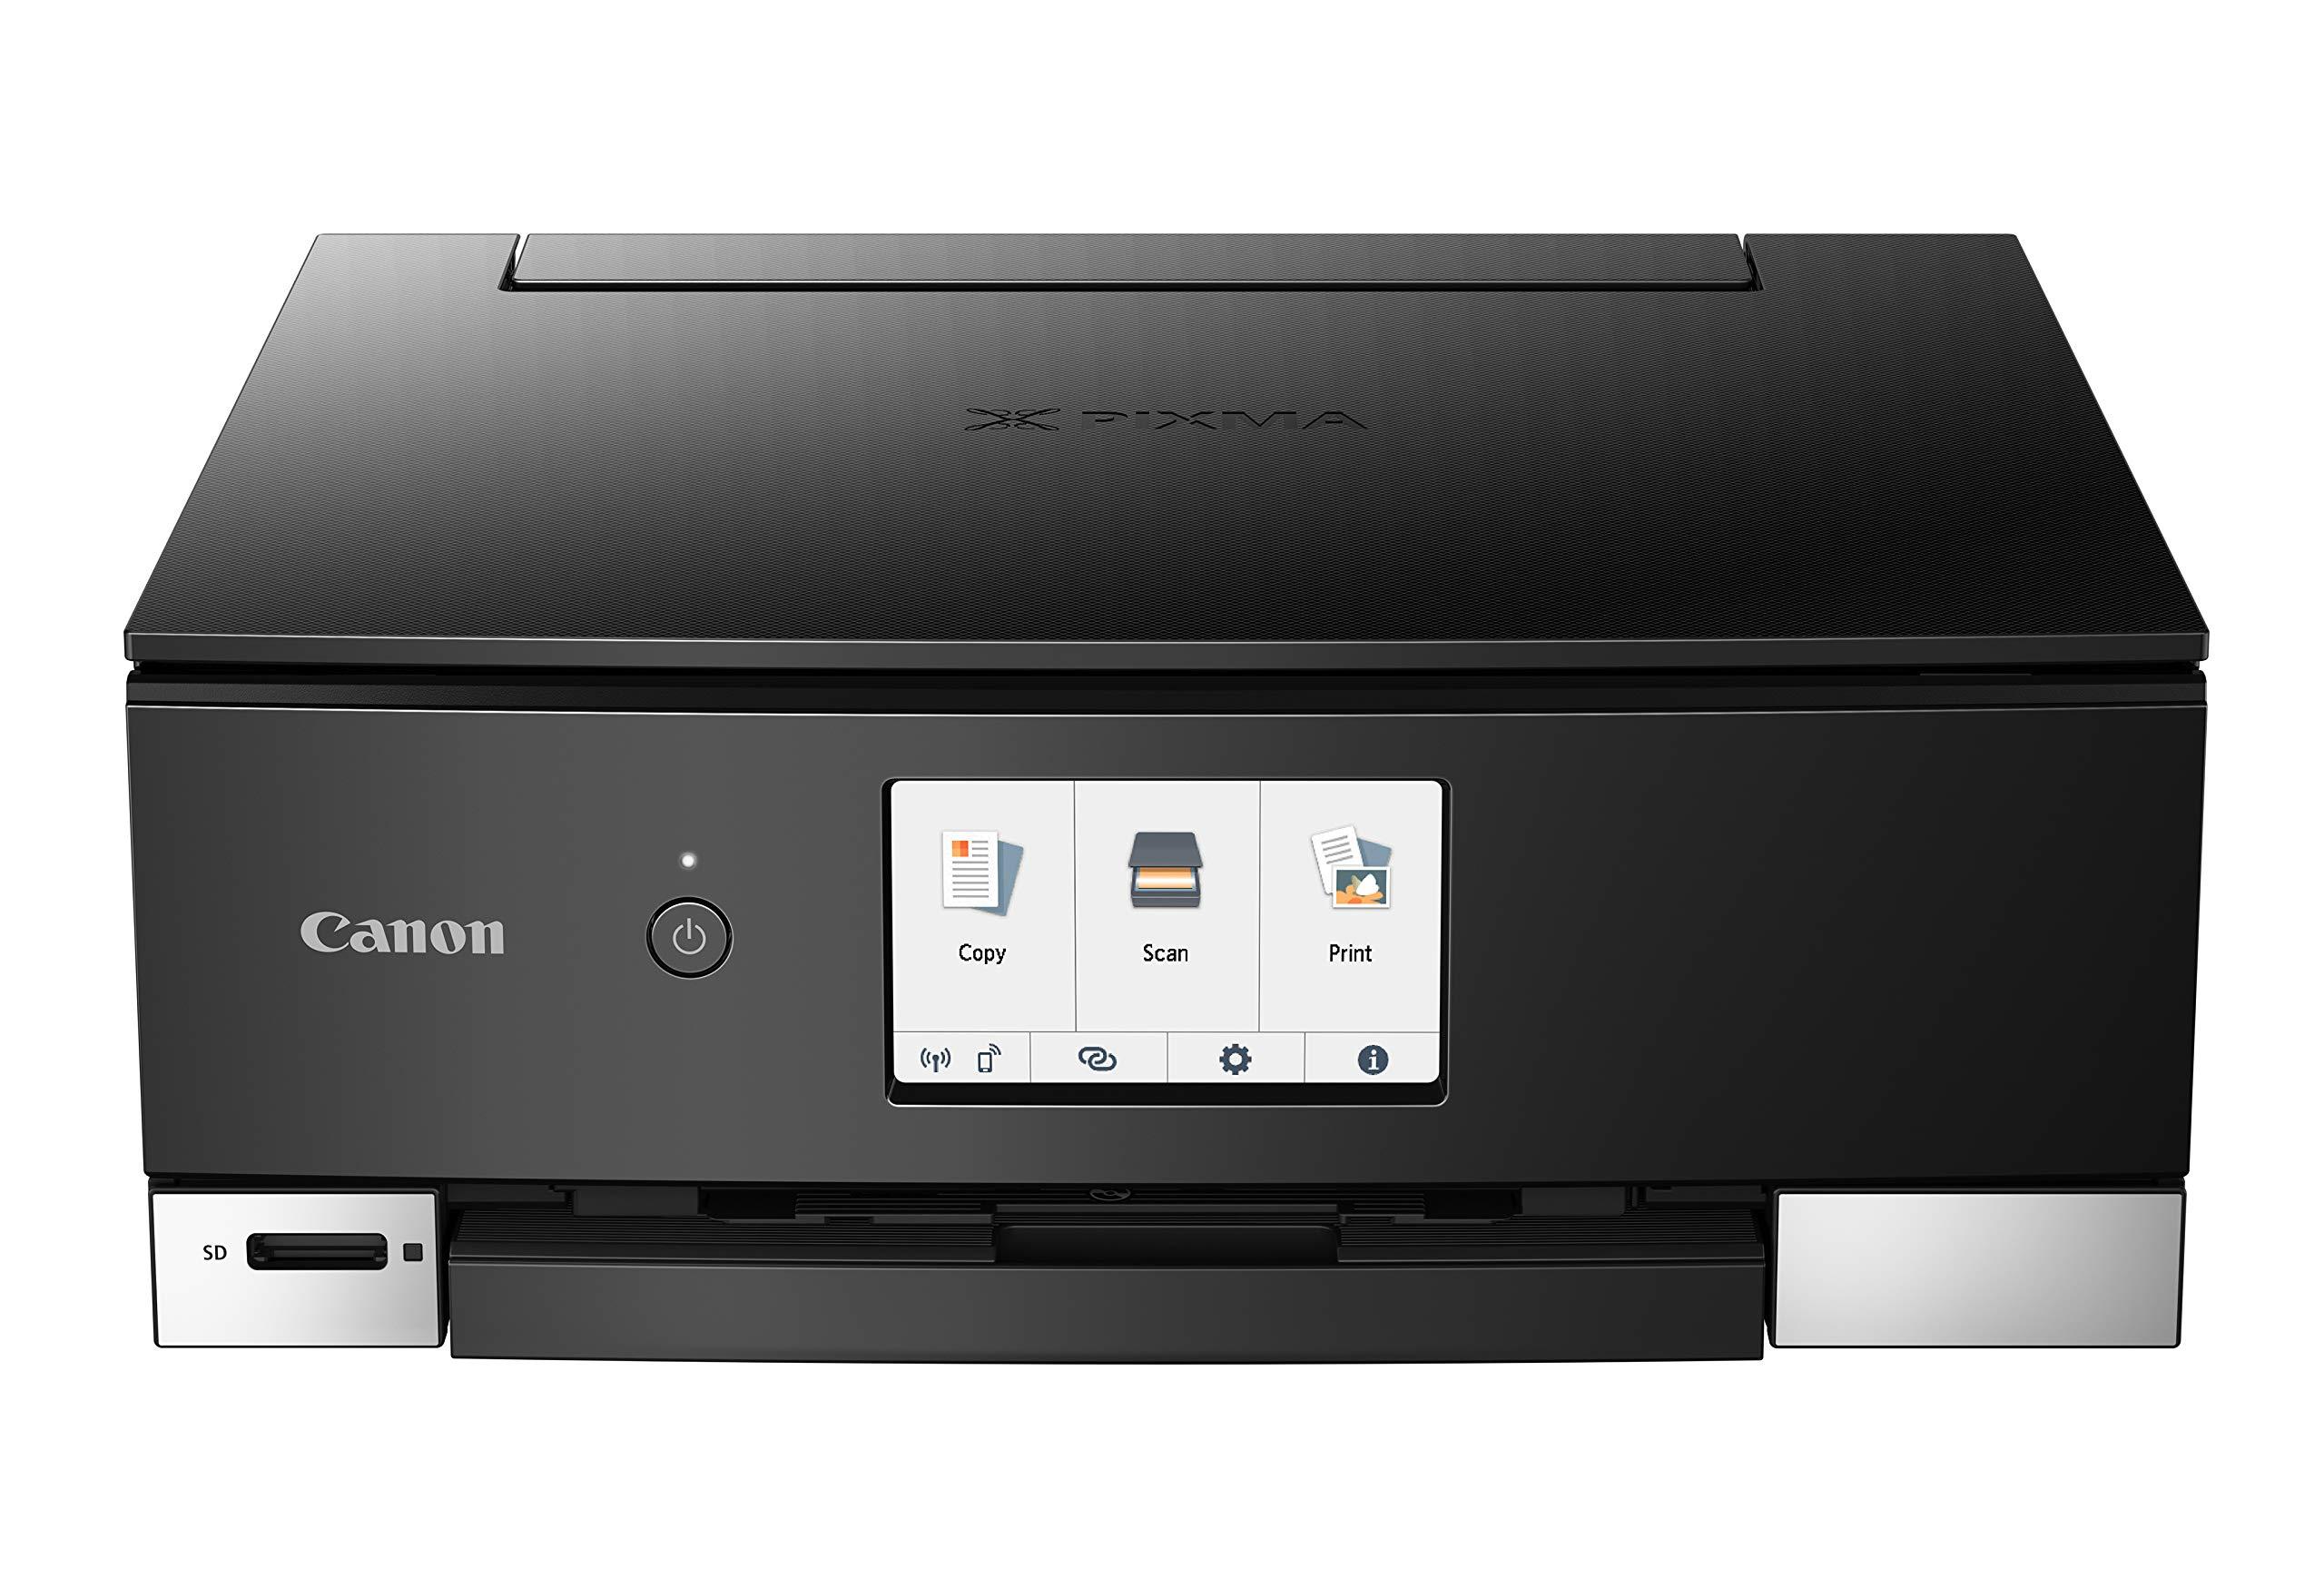 Canon TS20 All in One Wireless Color Printer for Home   Copier ...